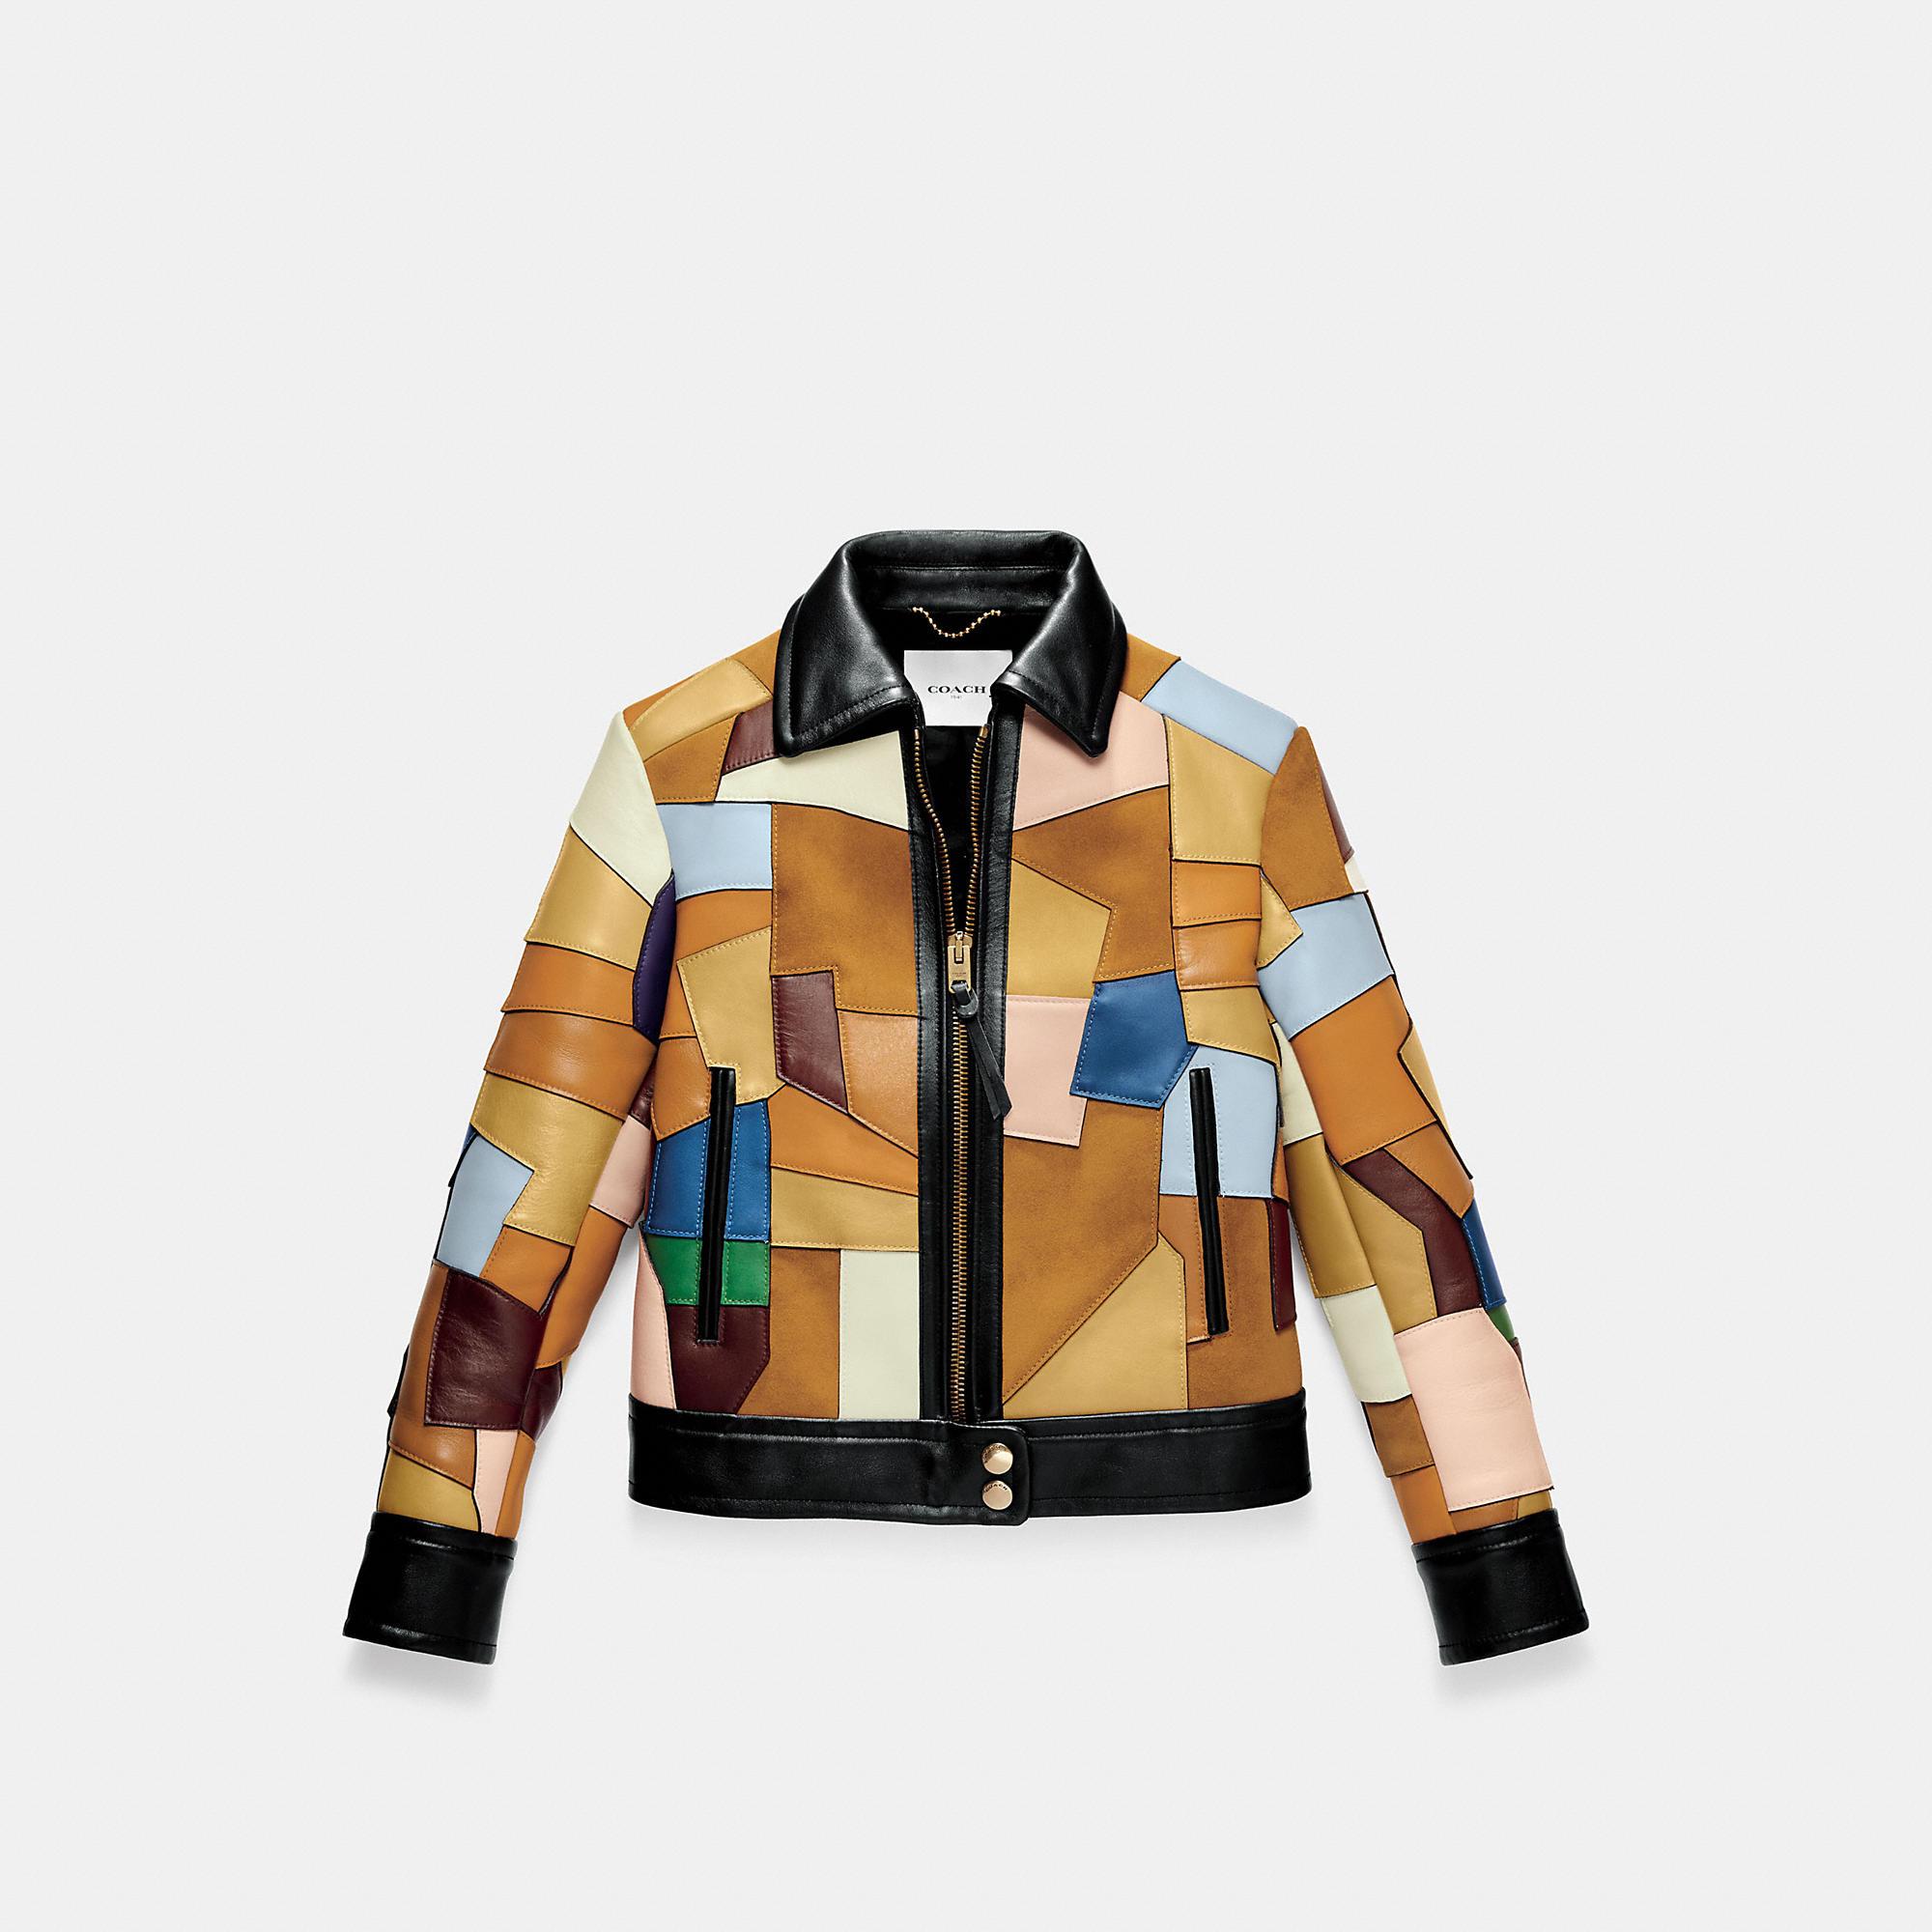 Coach 1941 Leather Patched Mod Jacket Women S Mod Jacket Spring Outerwear Designer Winter Jackets [ 2000 x 2000 Pixel ]